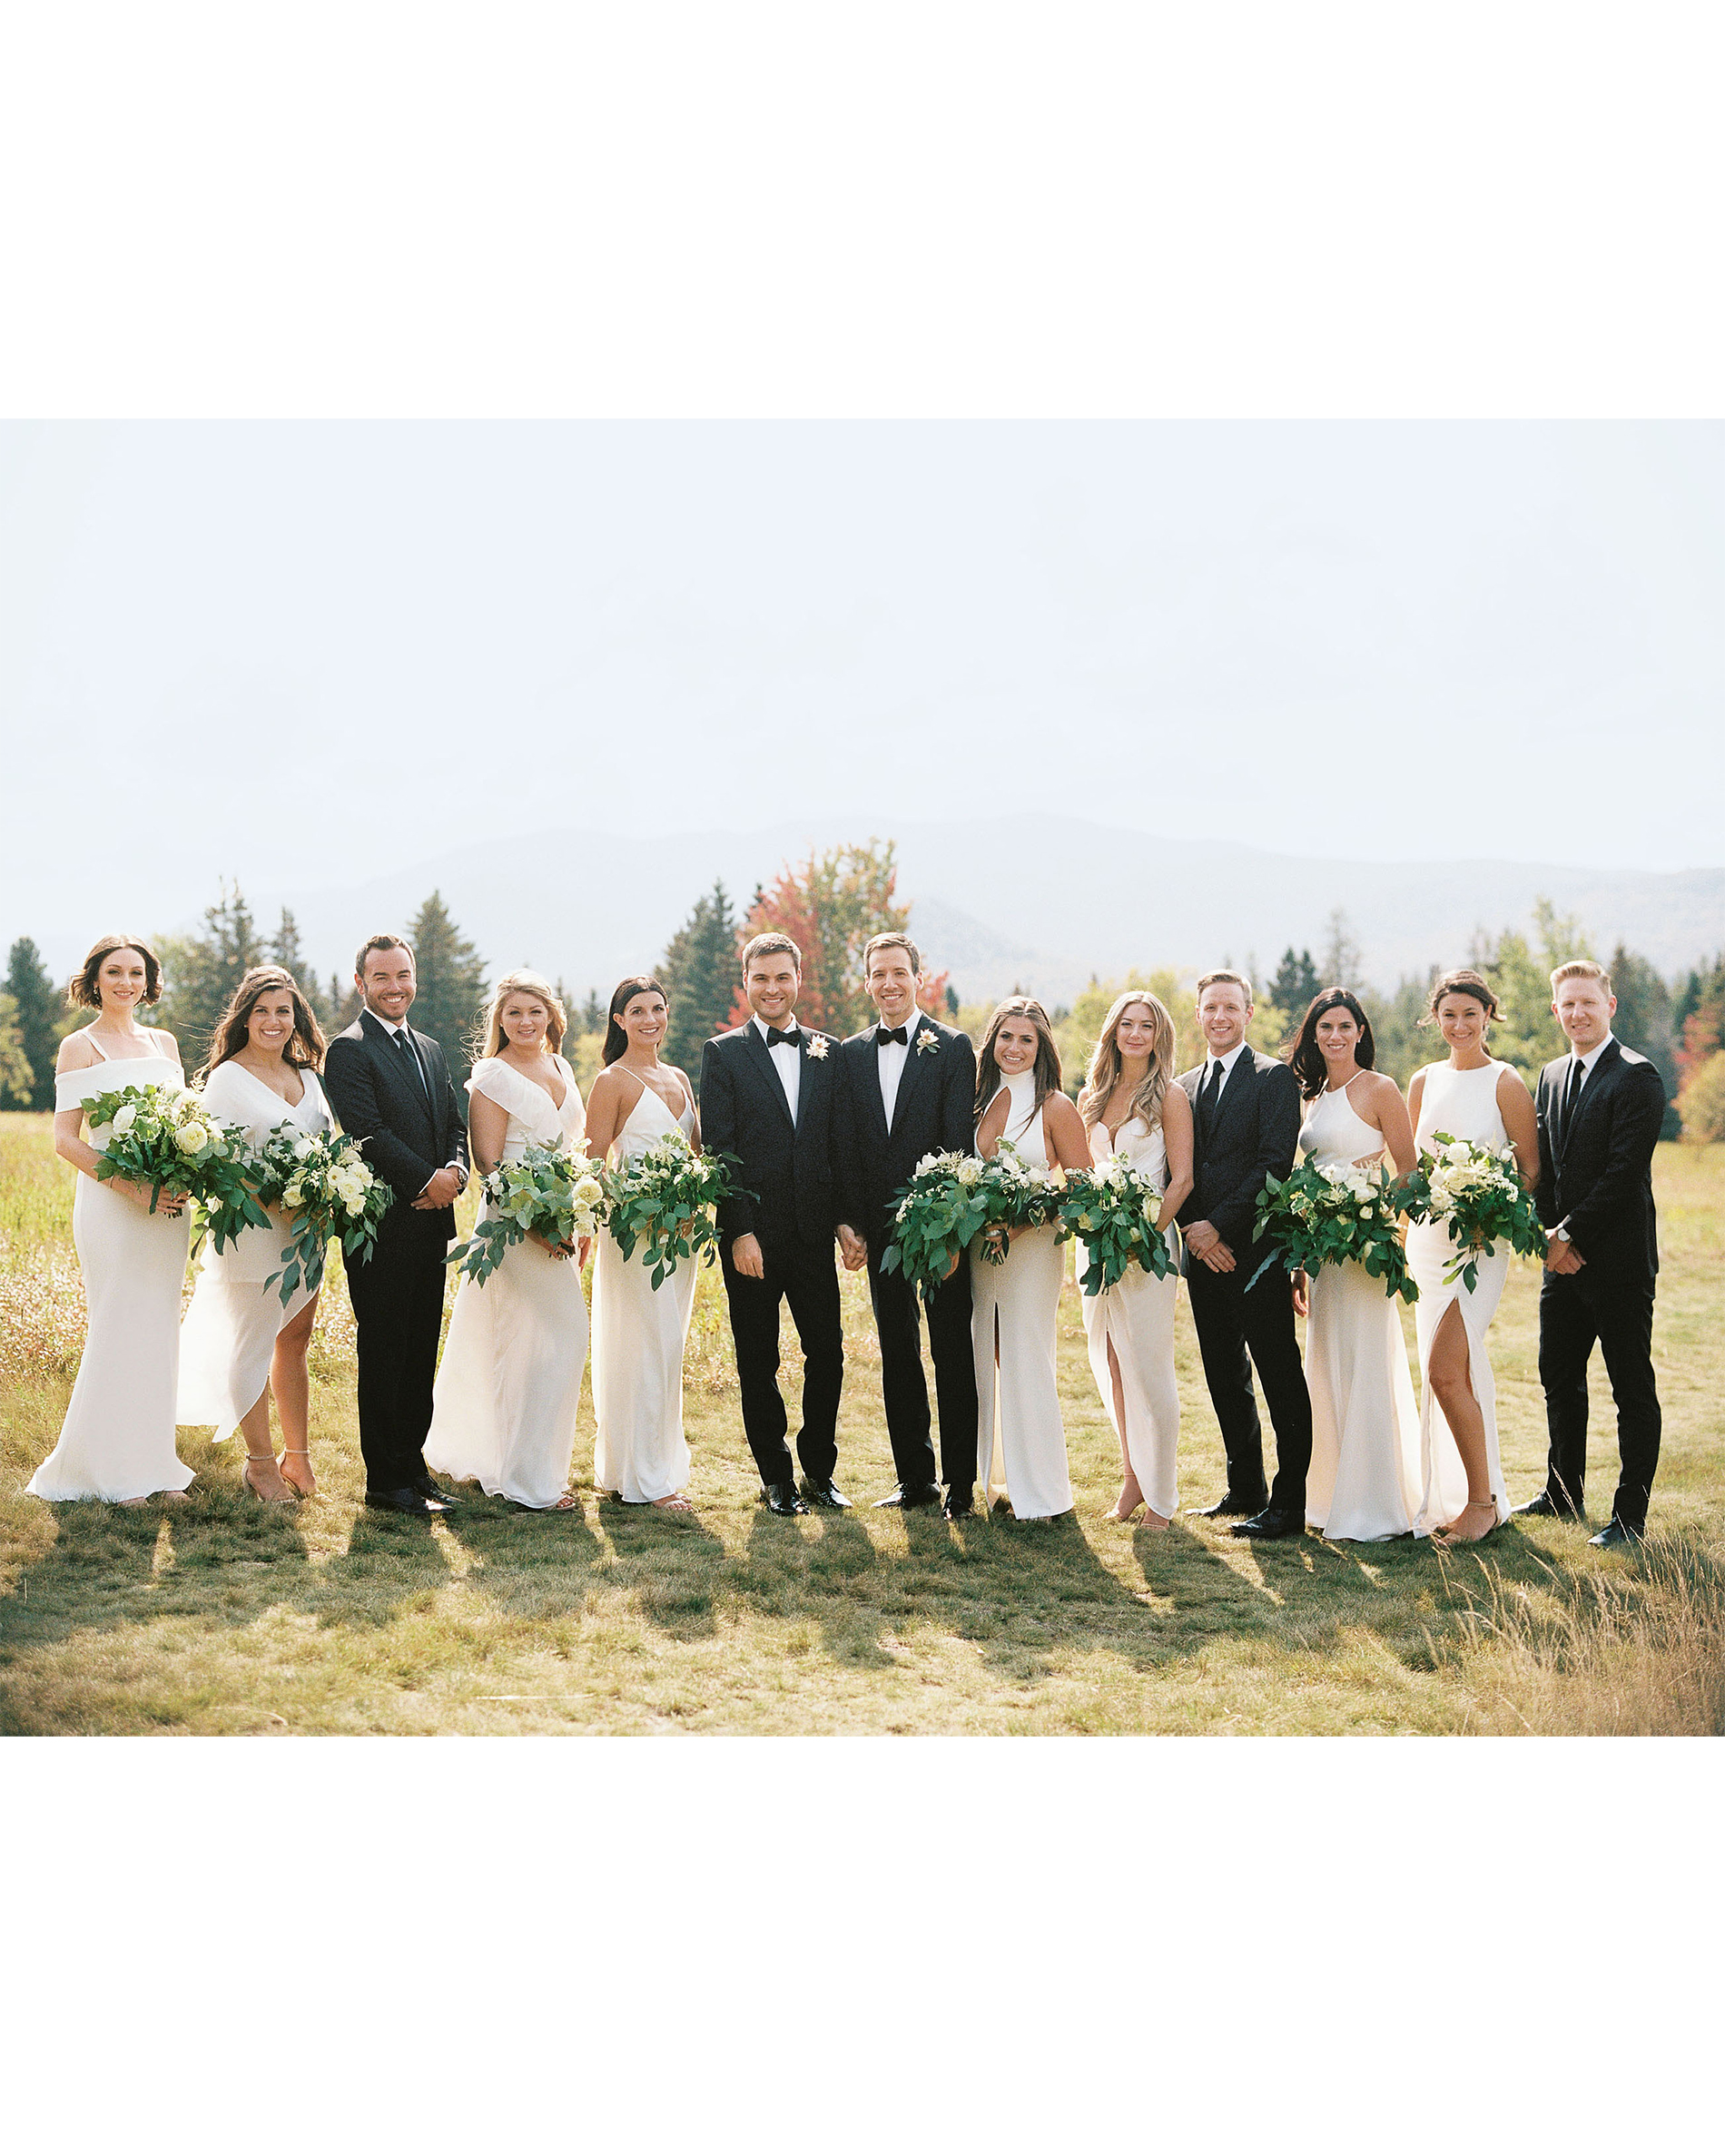 tory sean wedding lake placid new york wedding party